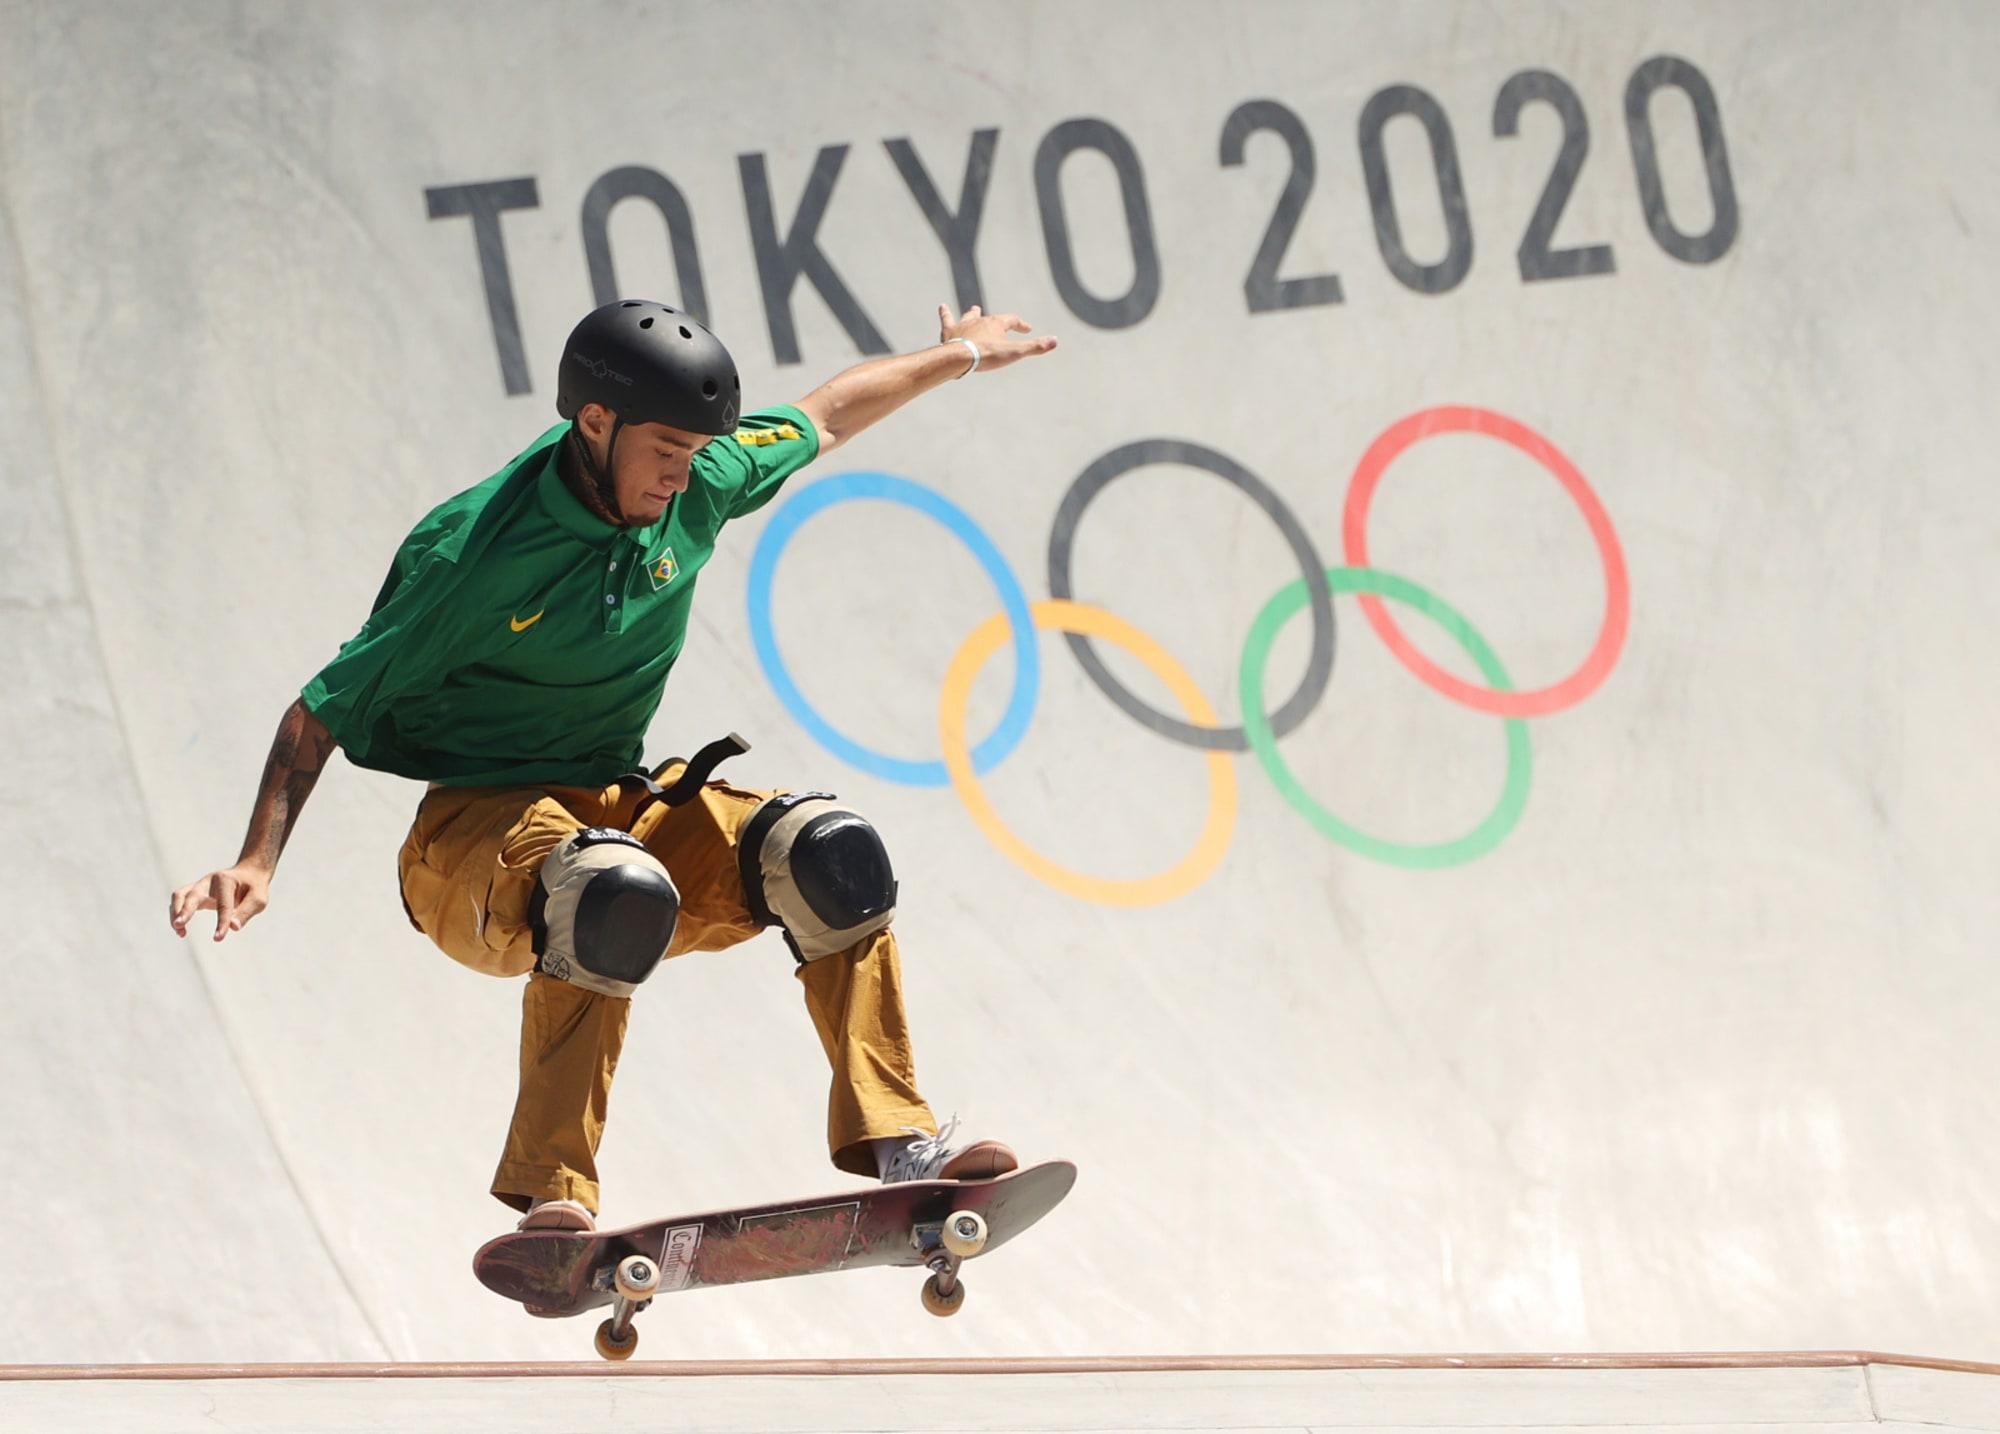 2021 Olympics men's park skateboarding final: How to watch online